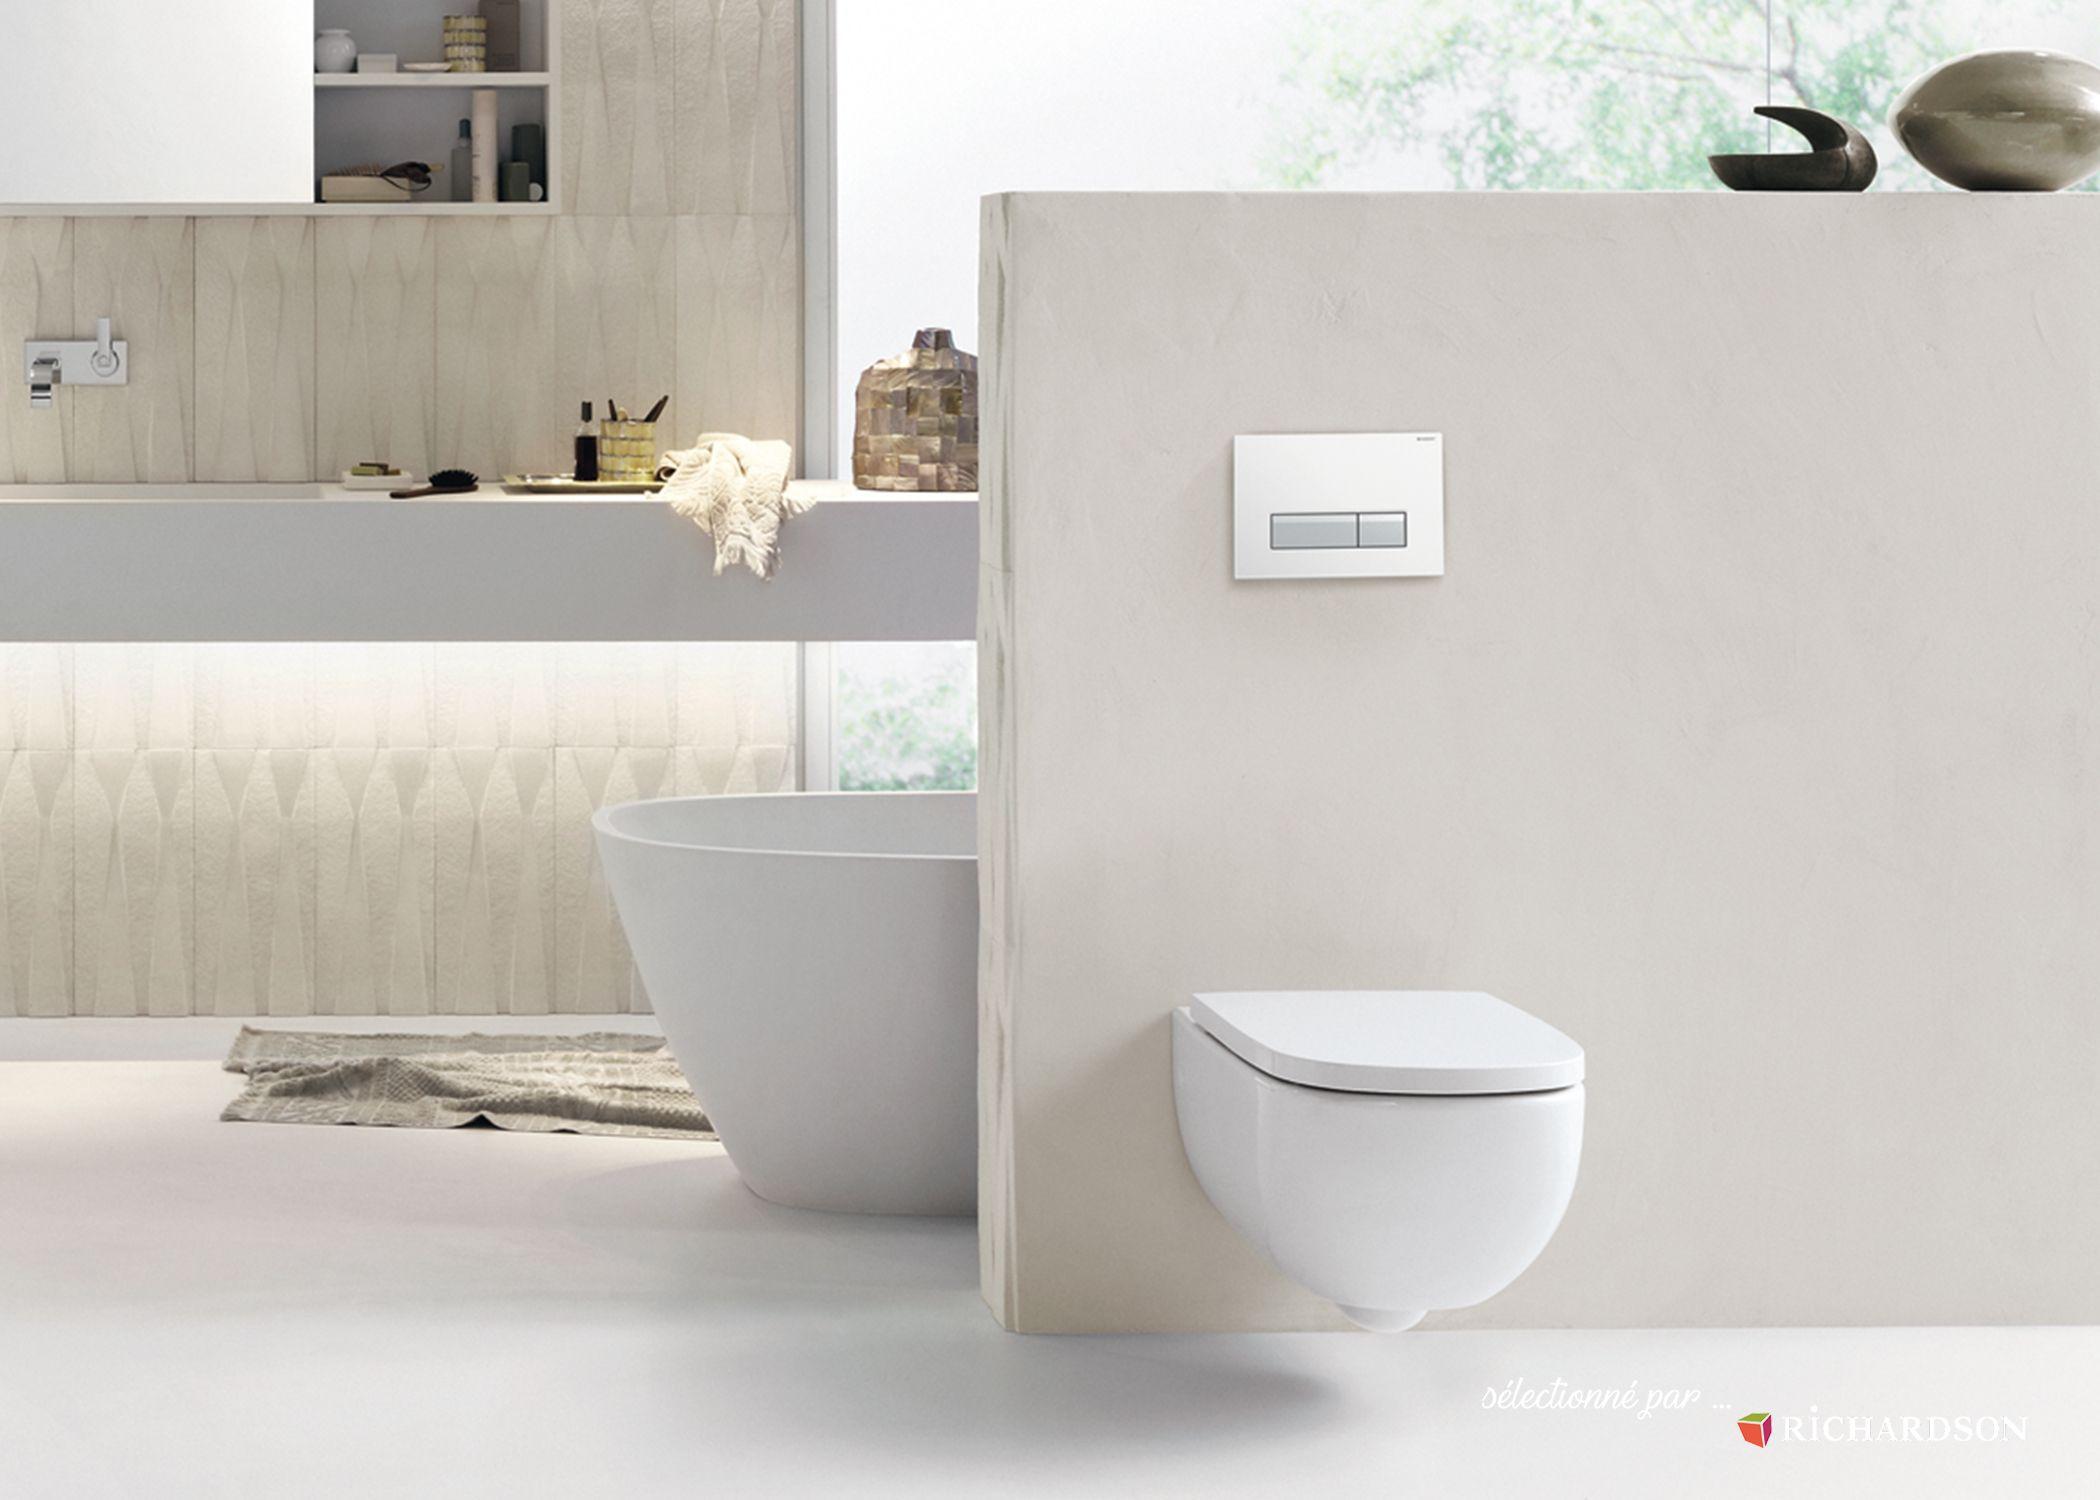 Marque De Toilette Suspendue toilettes suspendus geberit | toilette suspendu, toilette